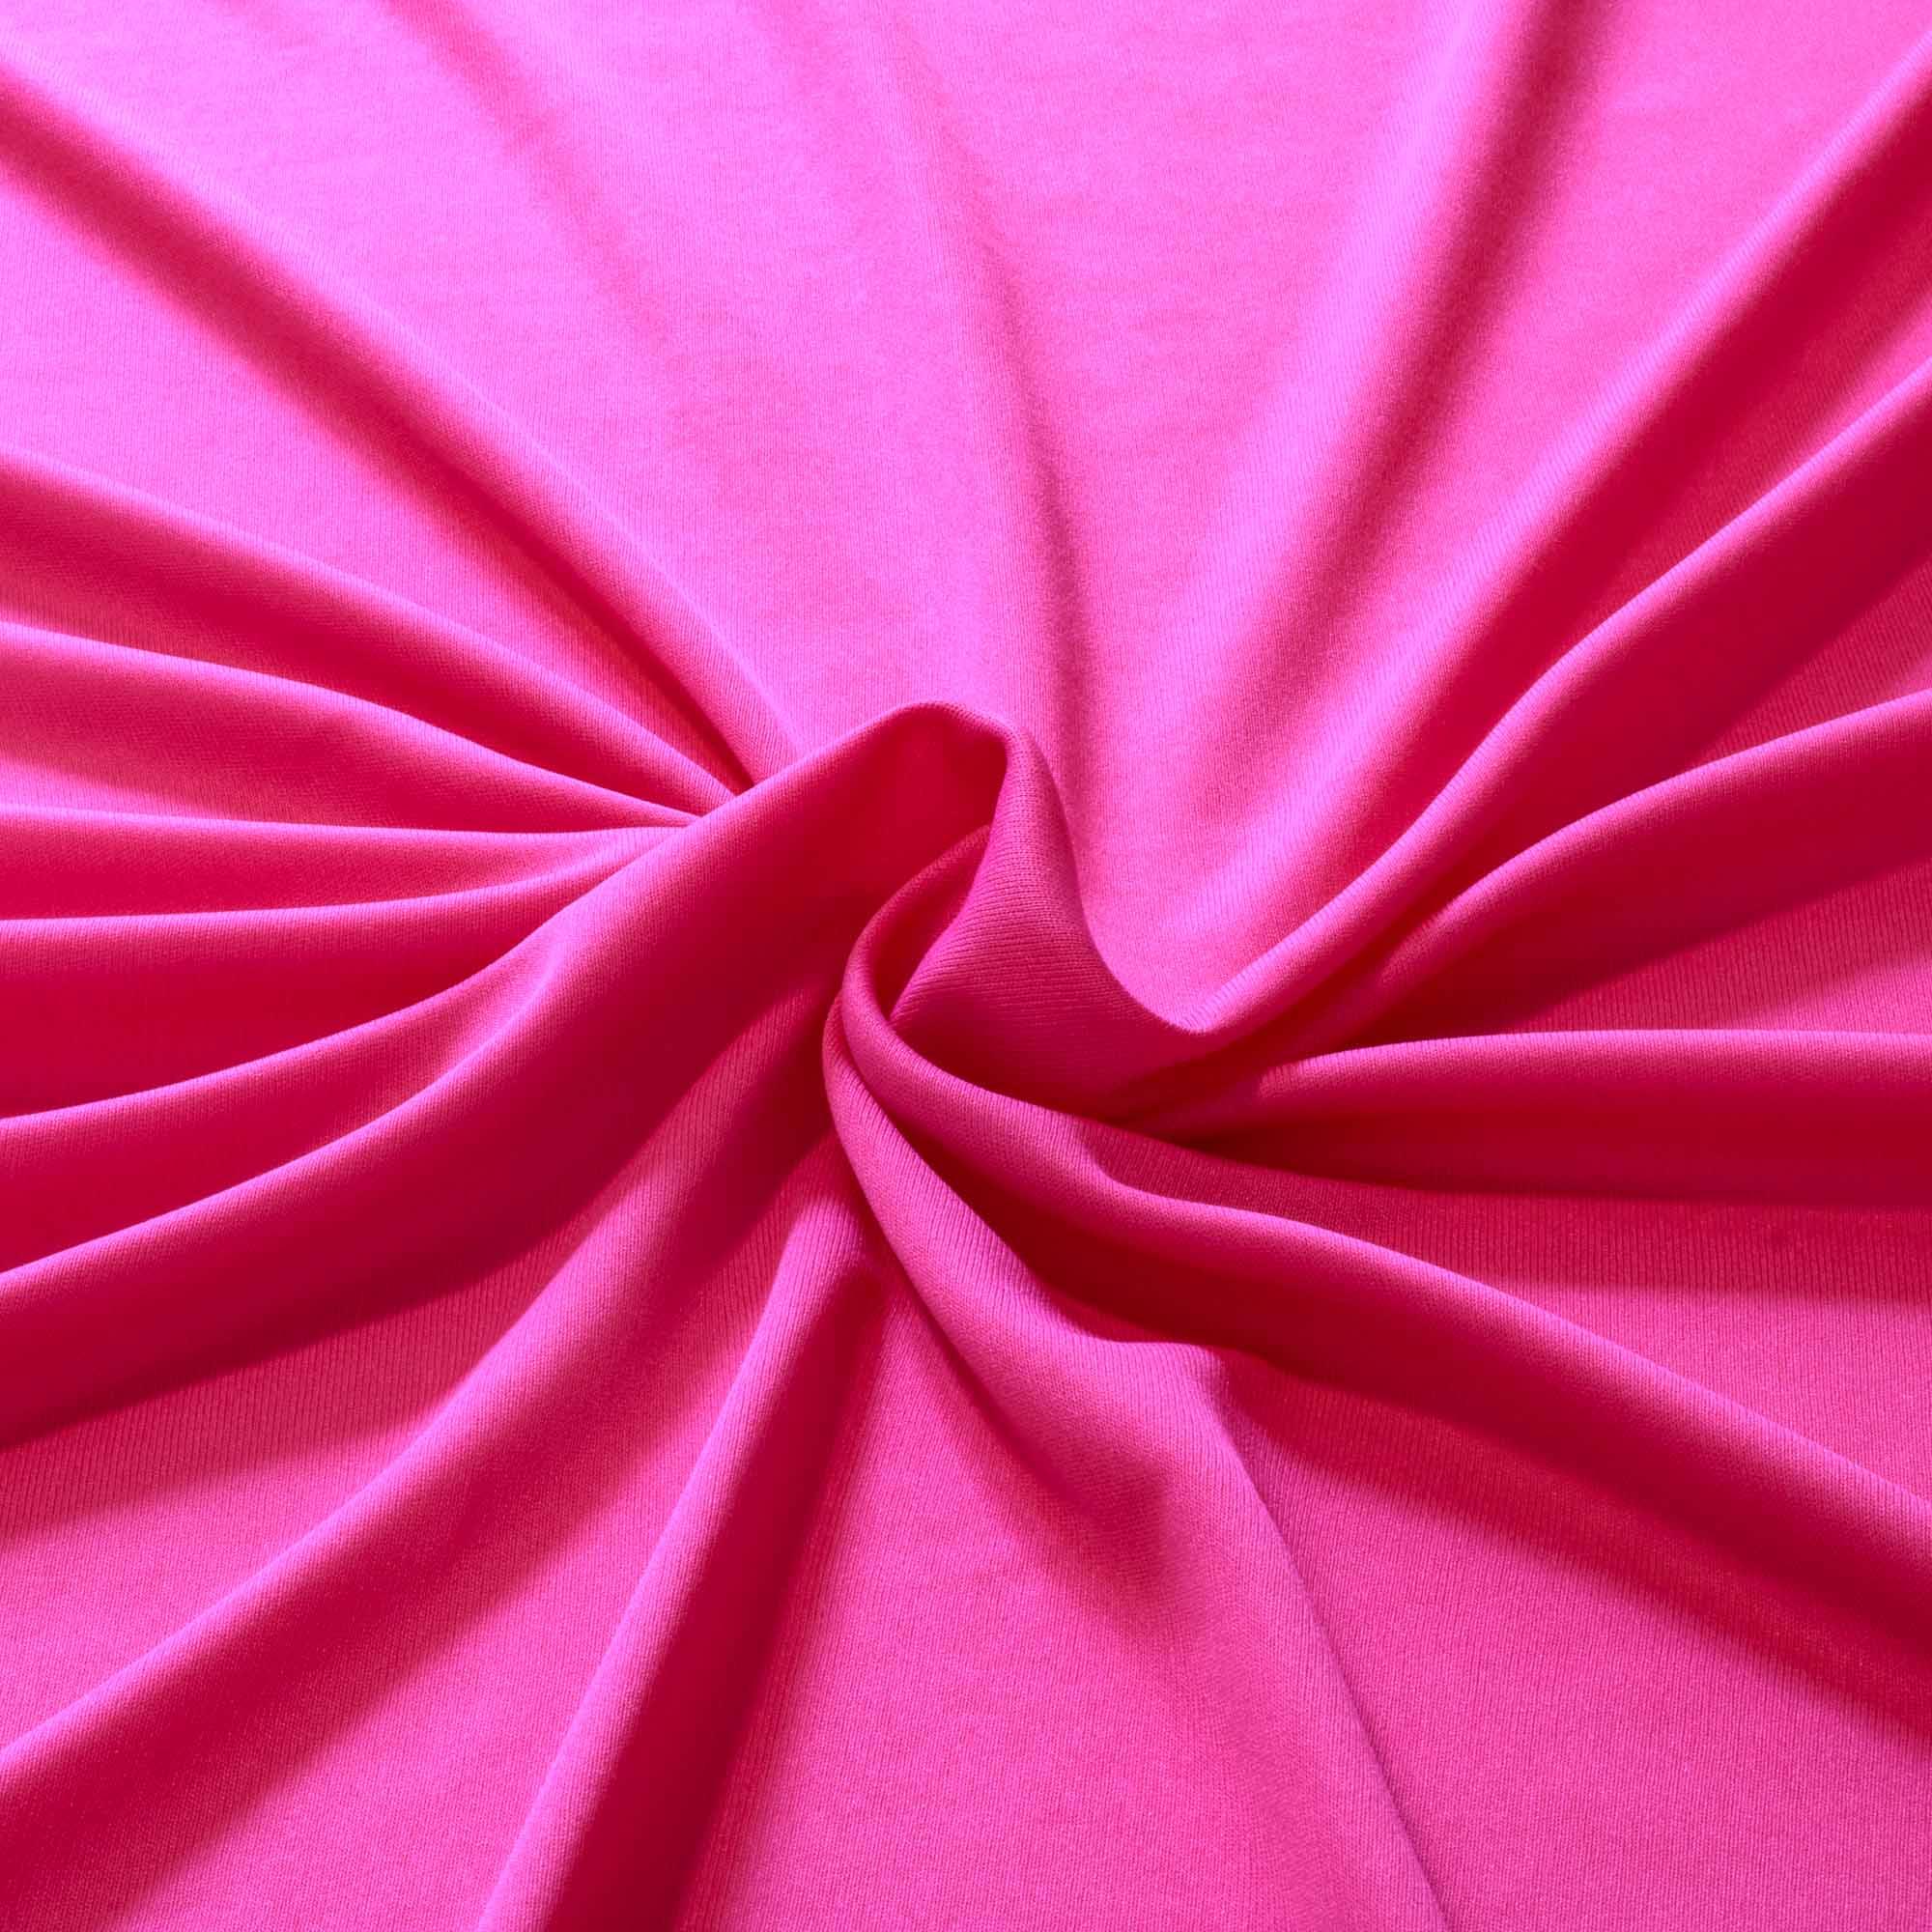 Tecido Malha Helanca Light Rosa Pink 100% Poliester 1,80 mt Largura